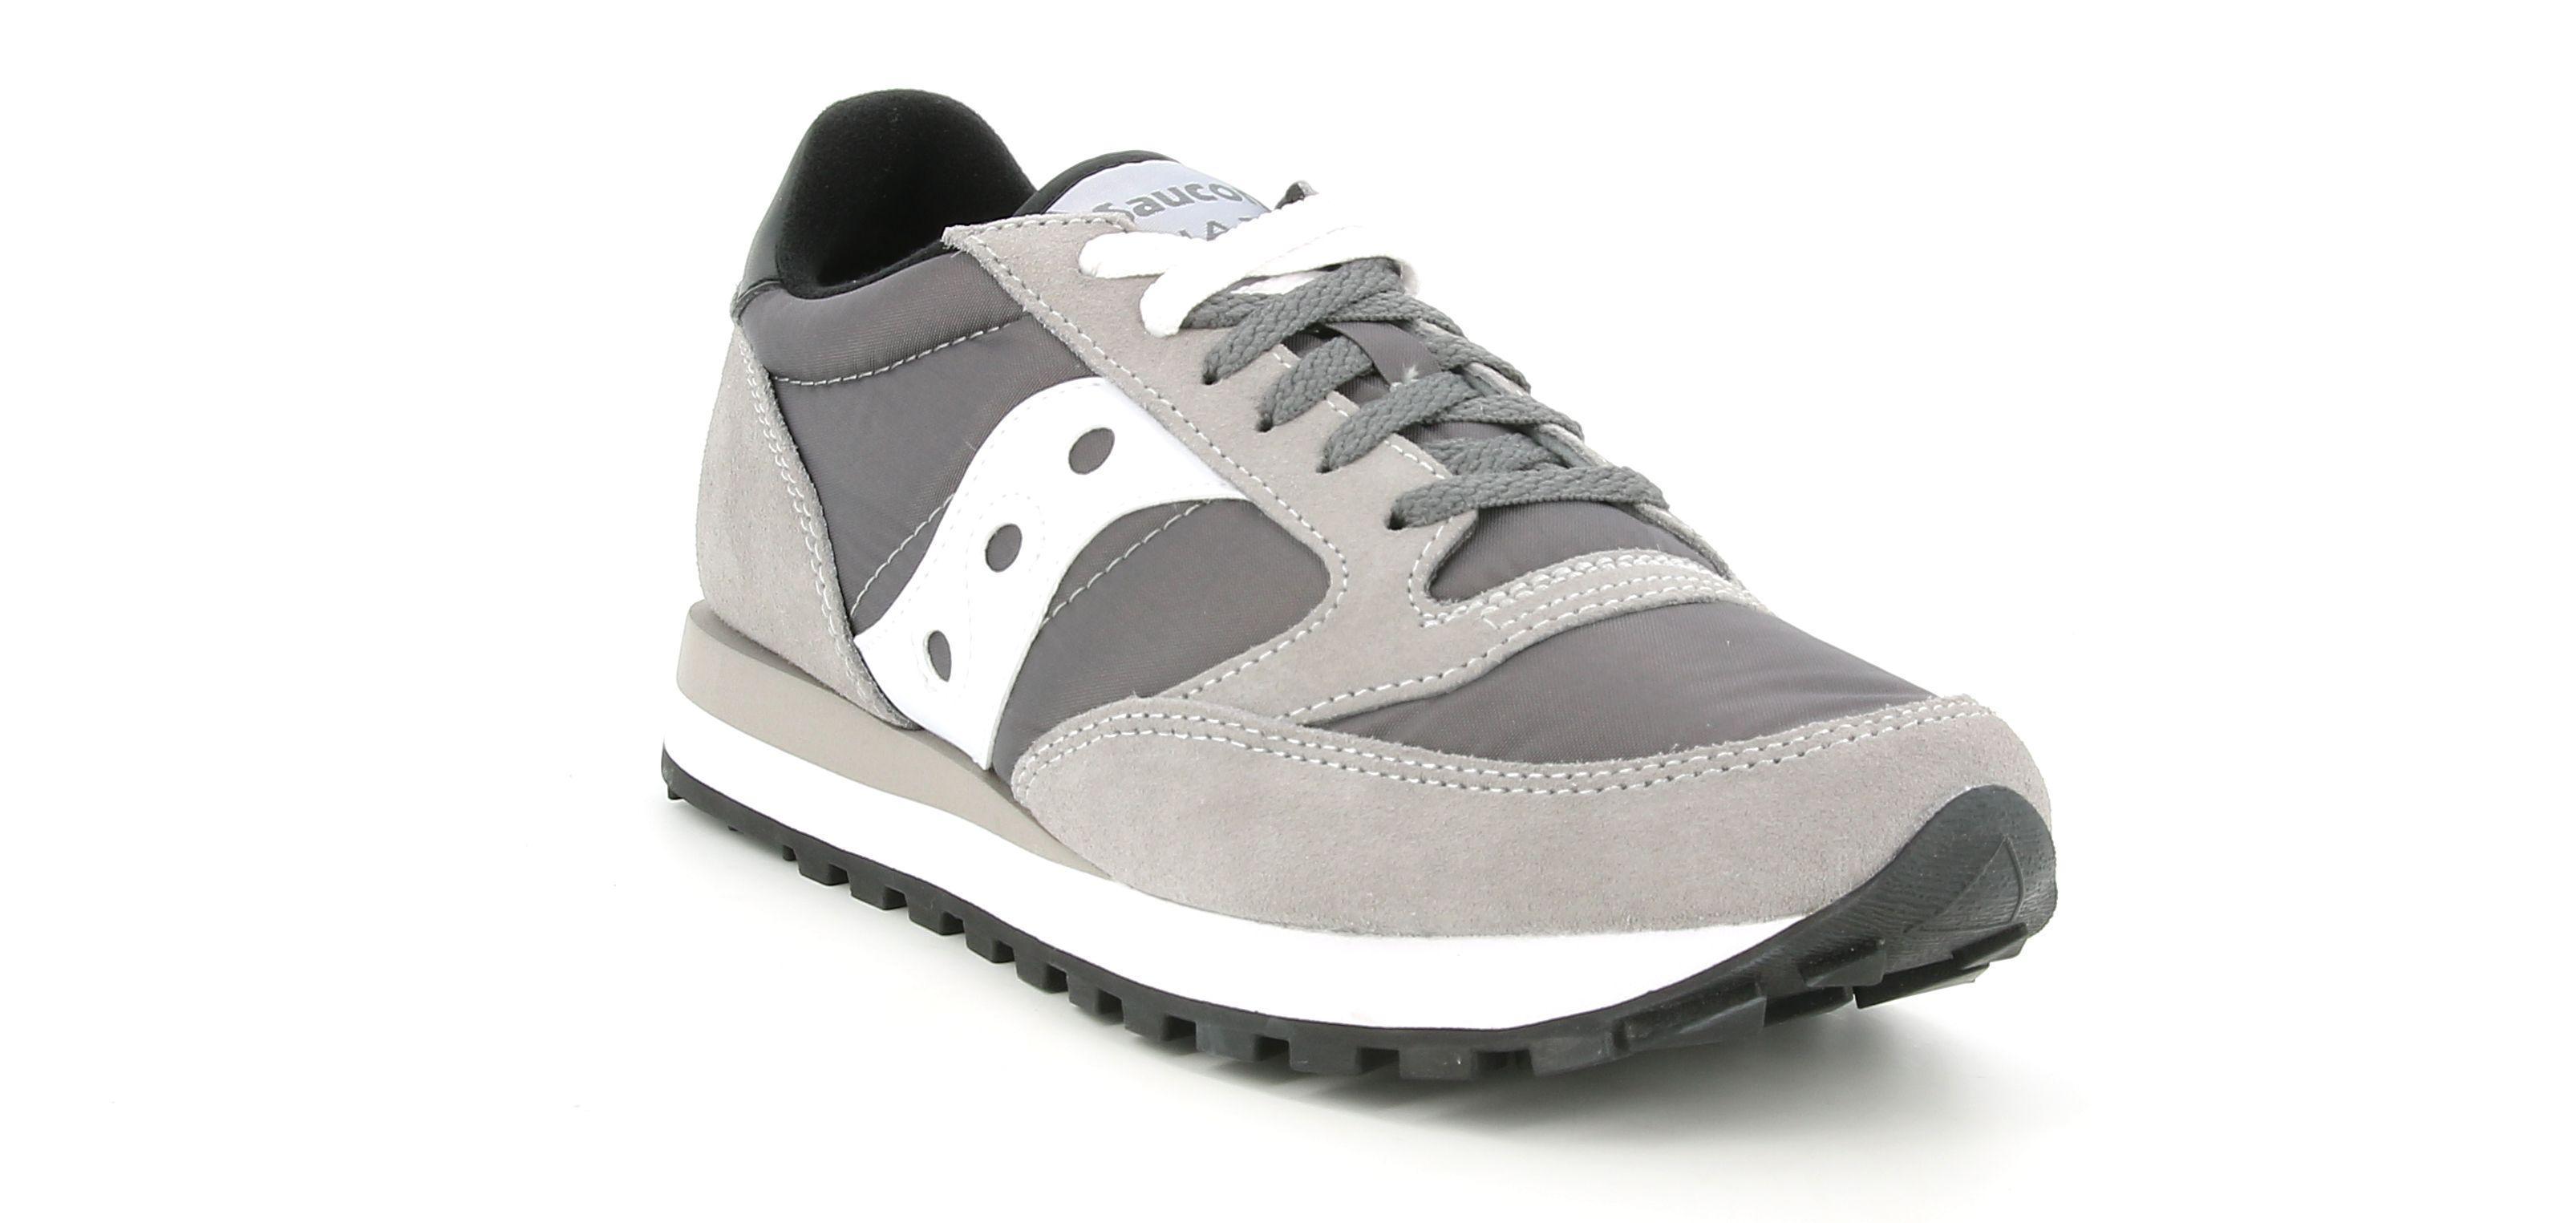 saucony saucony sneakers dk grey/white  s2044-553 grigio